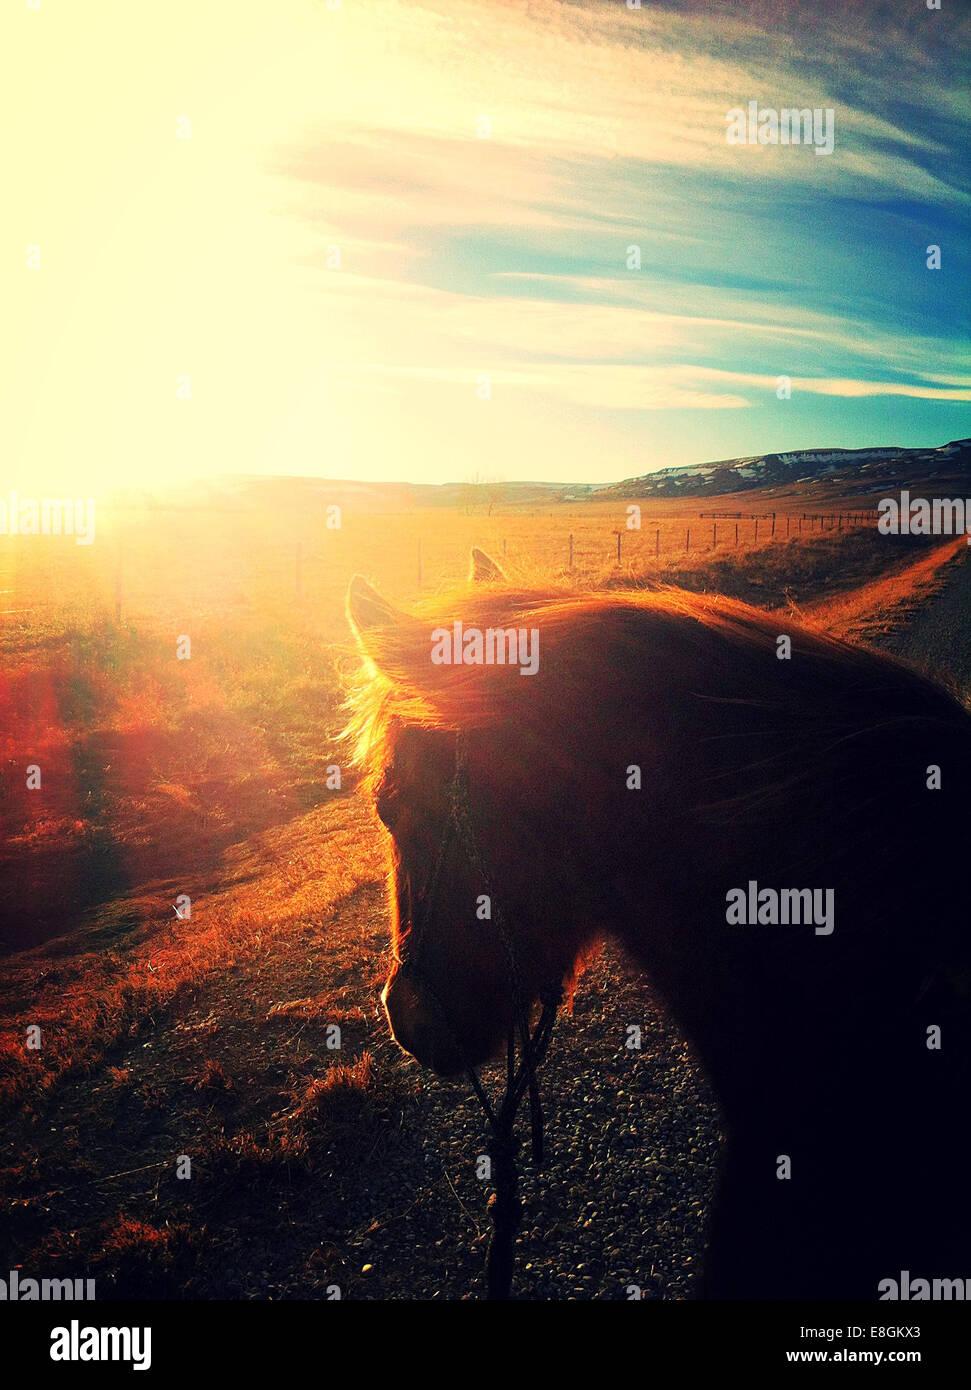 Canada, Alberta, Young horse at sunset - Stock Image